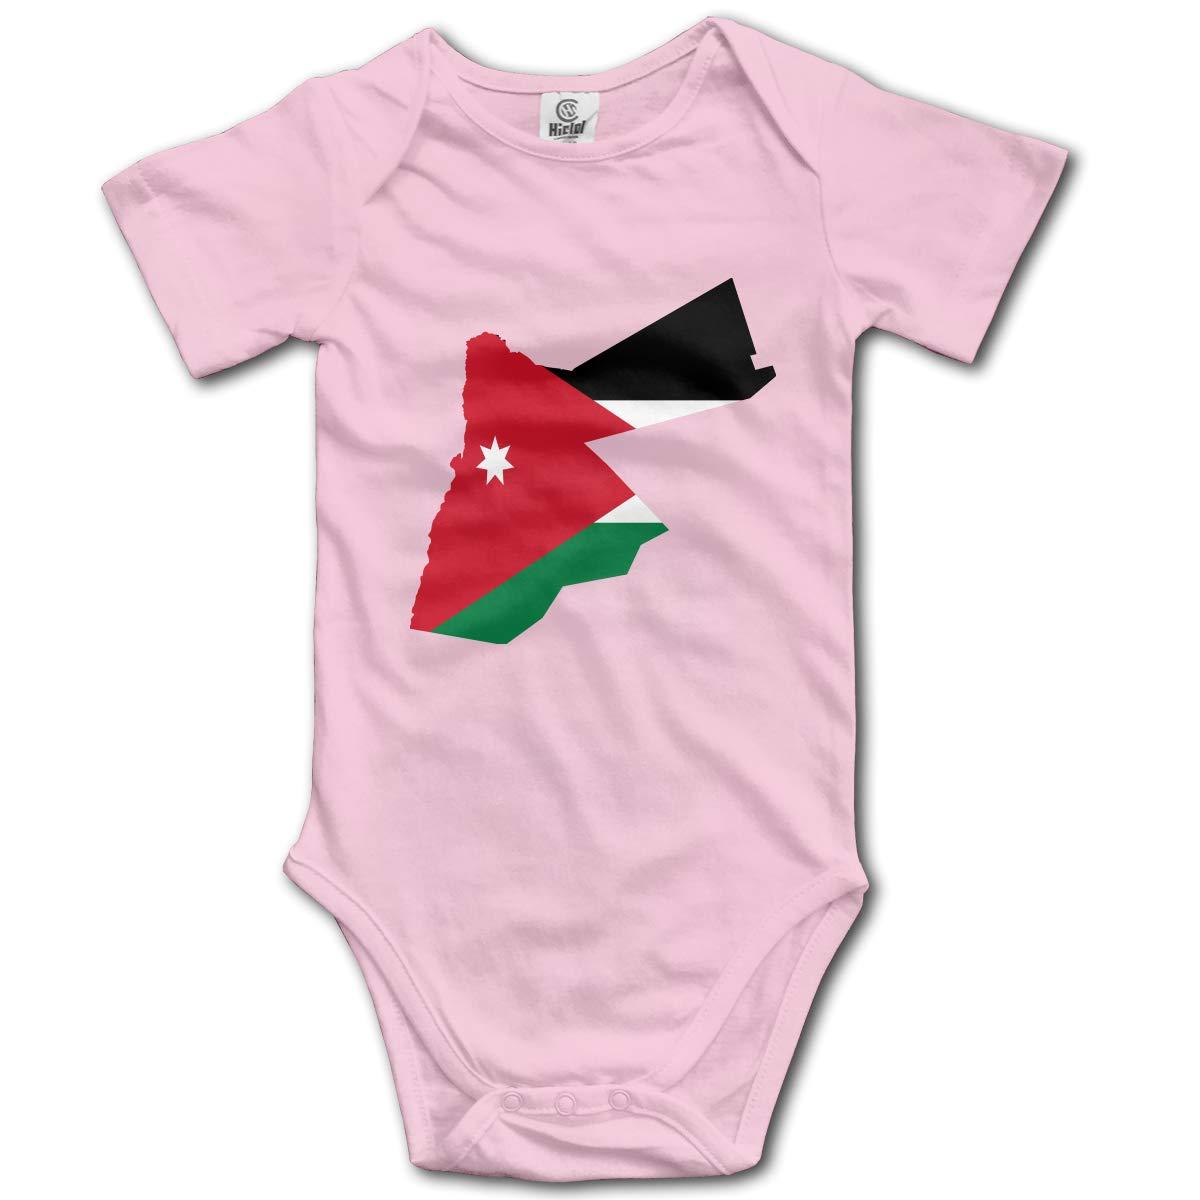 CUTEDWARF Baby Short-Sleeve Onesies Jordan Flag Map Bodysuit Baby Outfits